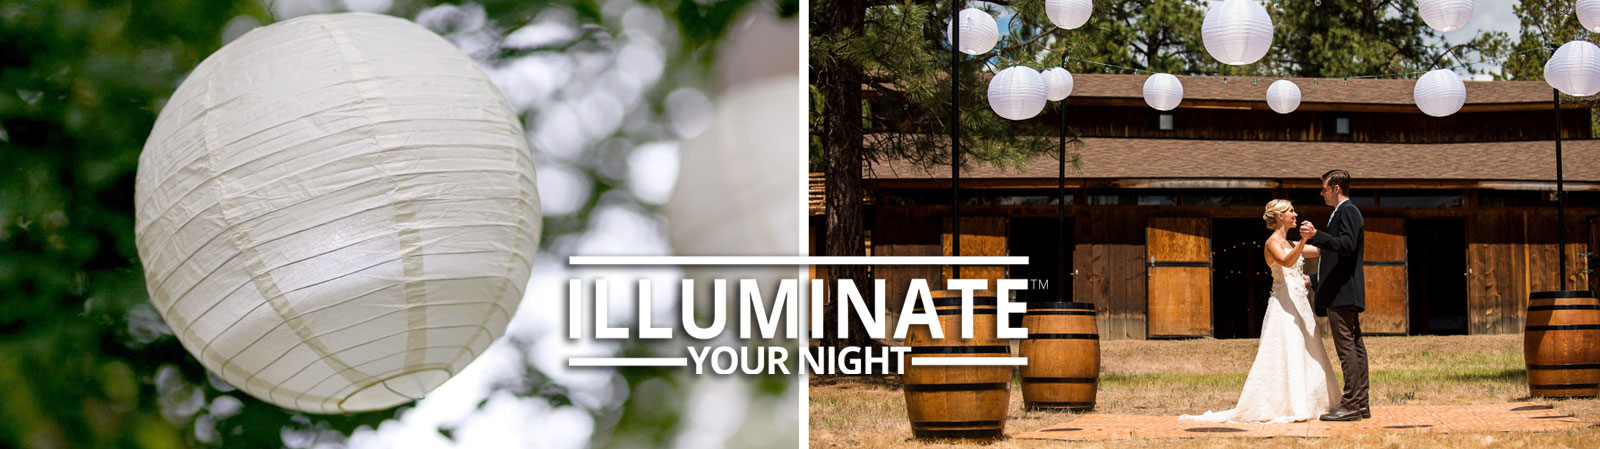 Illuminate Your Night custom lighting service Bend, Oregon